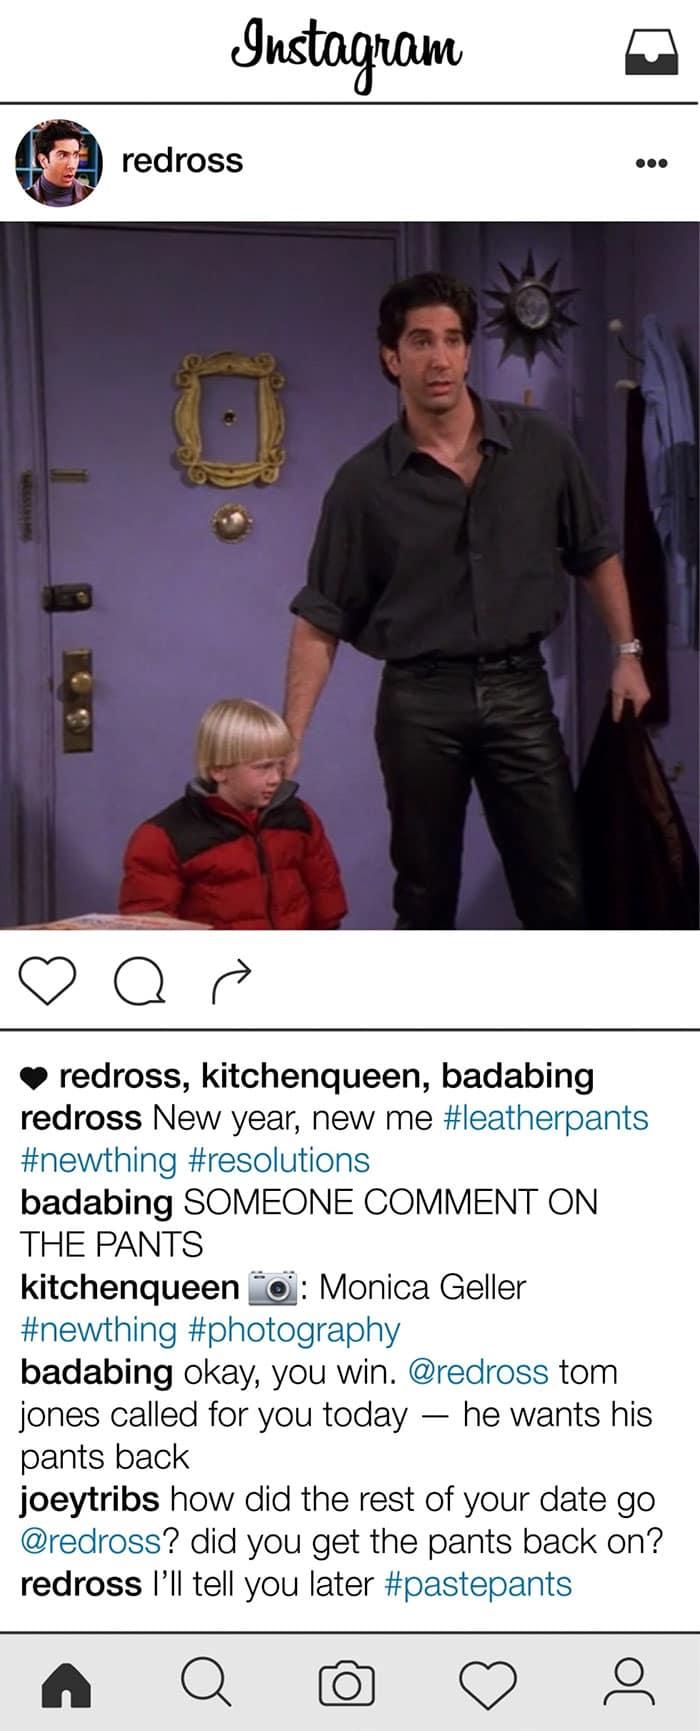 friends-ross-geller-instagram-leather-pants